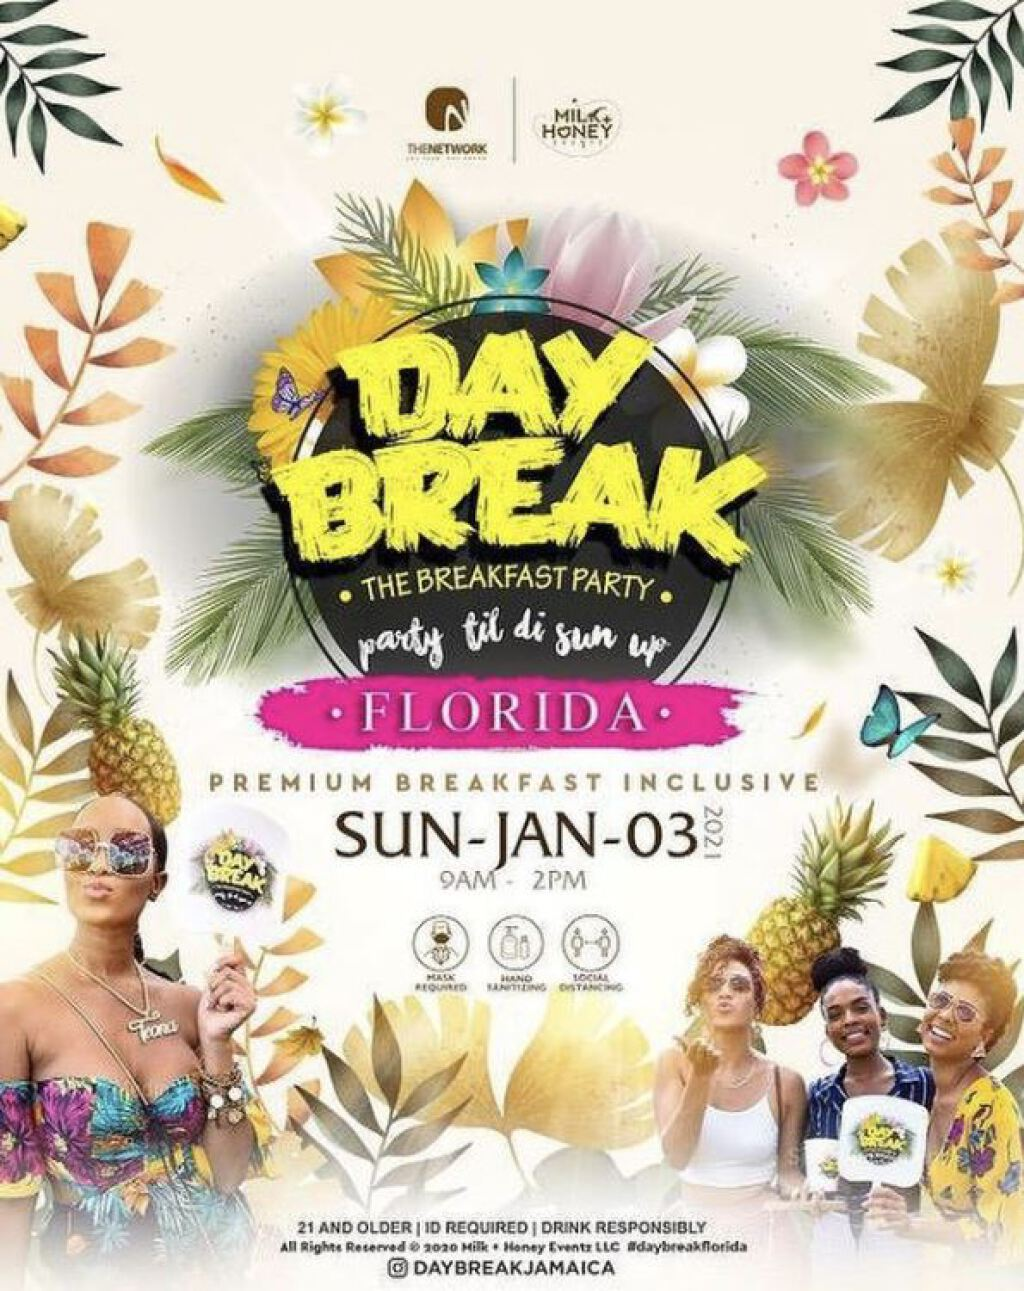 Day Break Breakfast Party flyer or graphic.